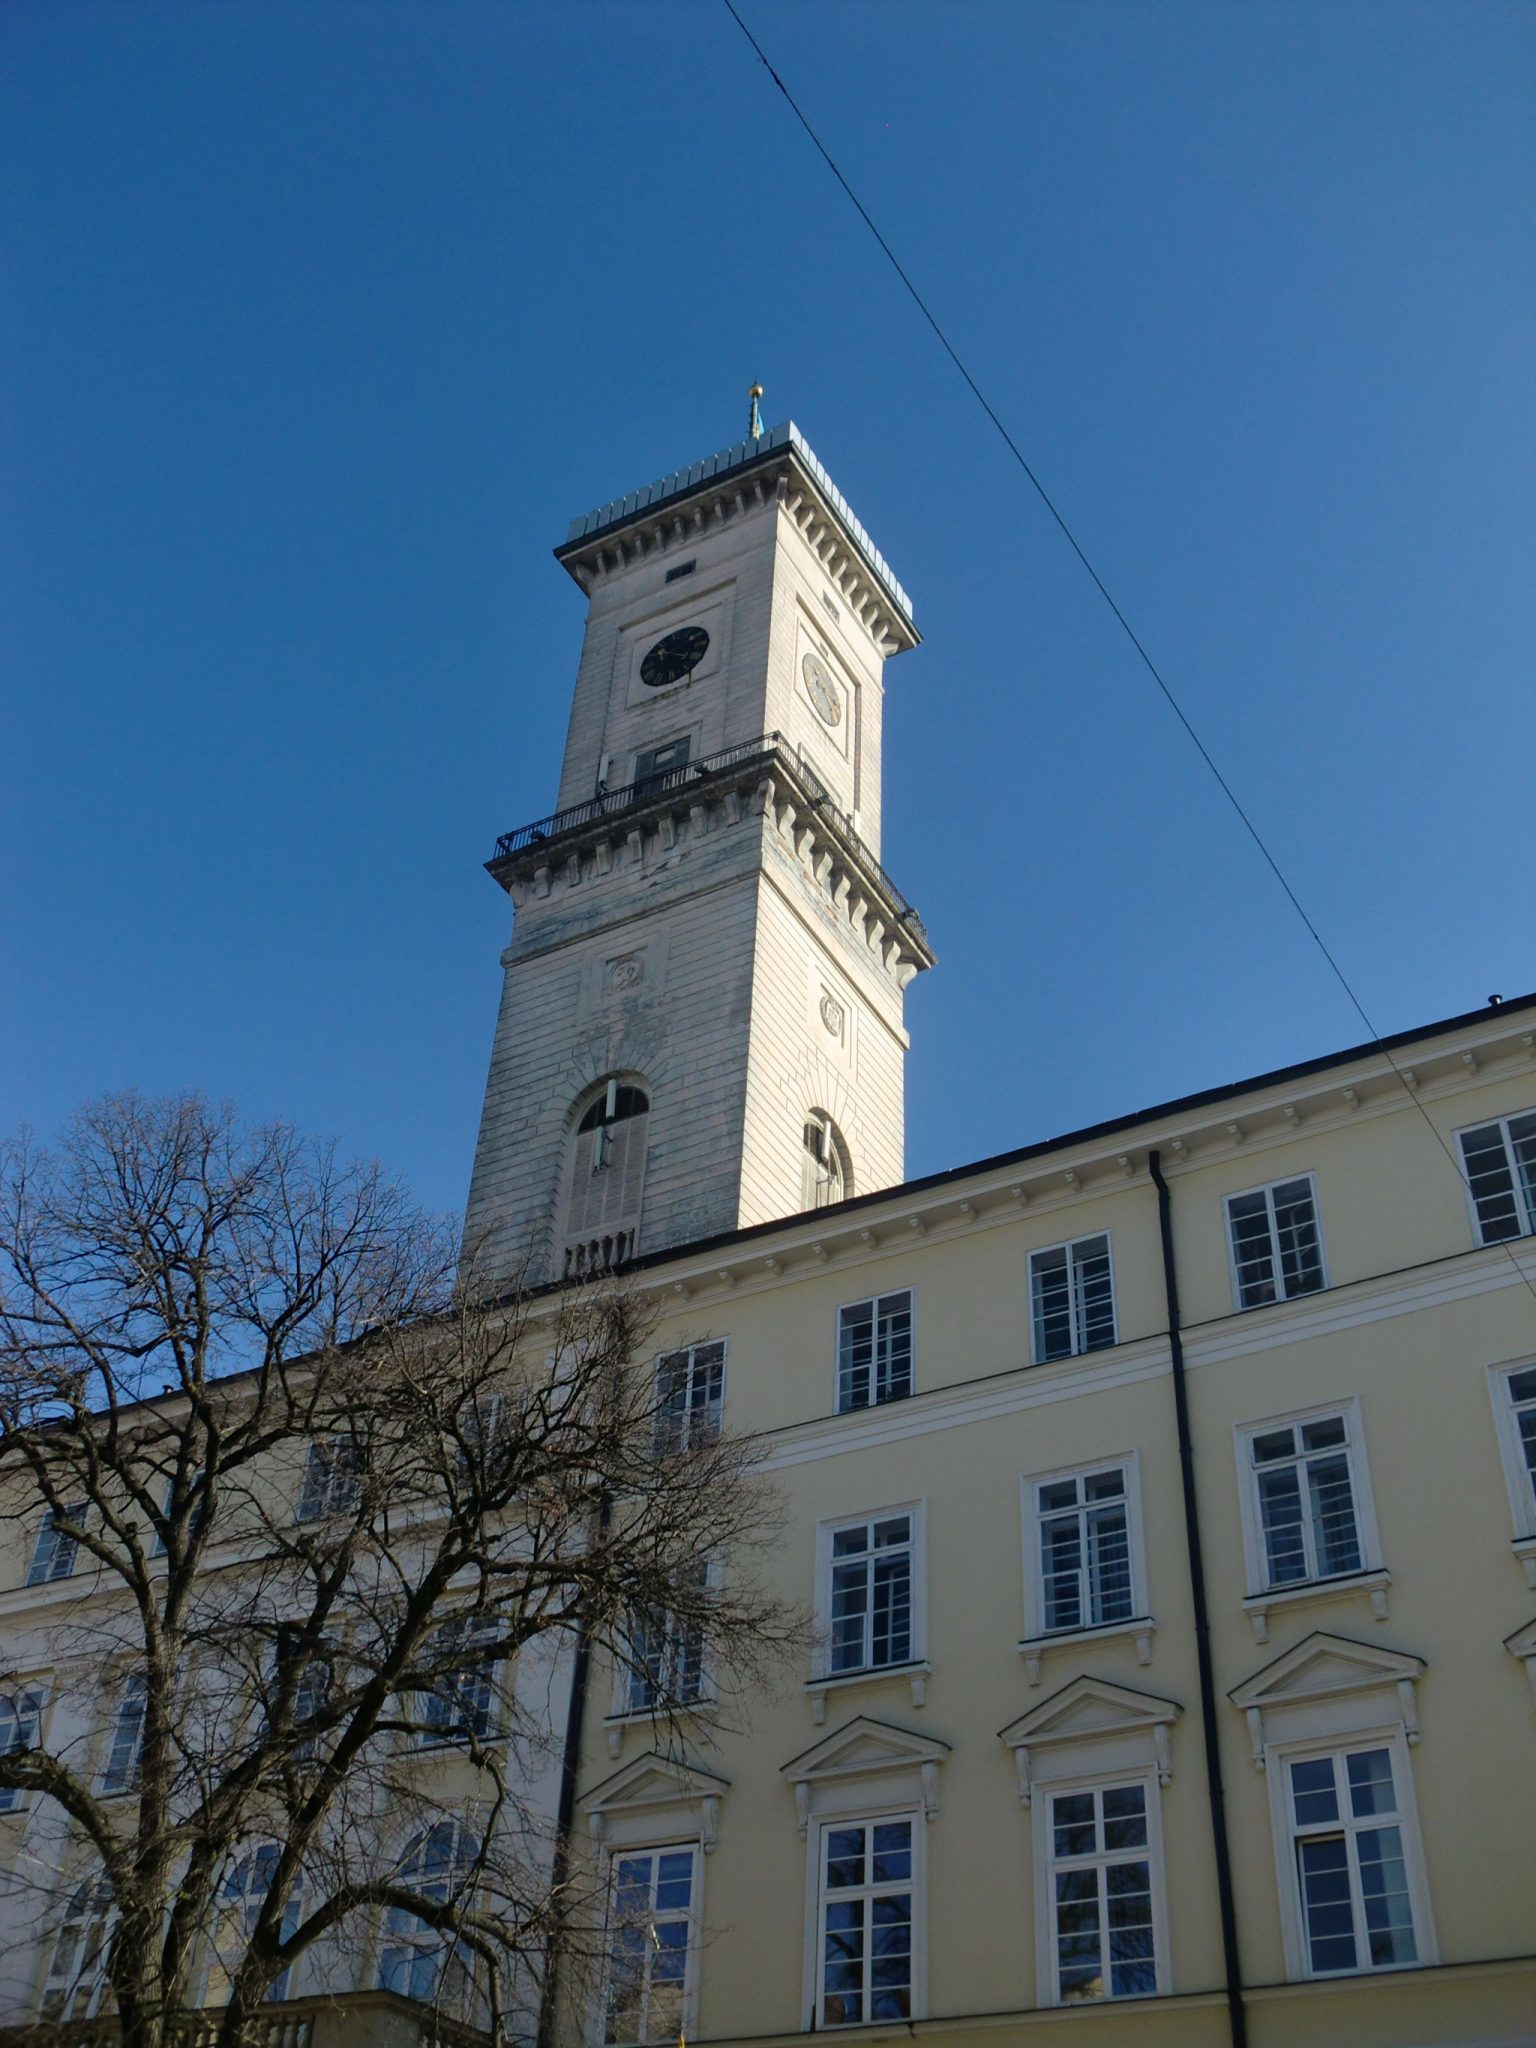 Lviv city hall - Lviv, the Ukrainian pearl